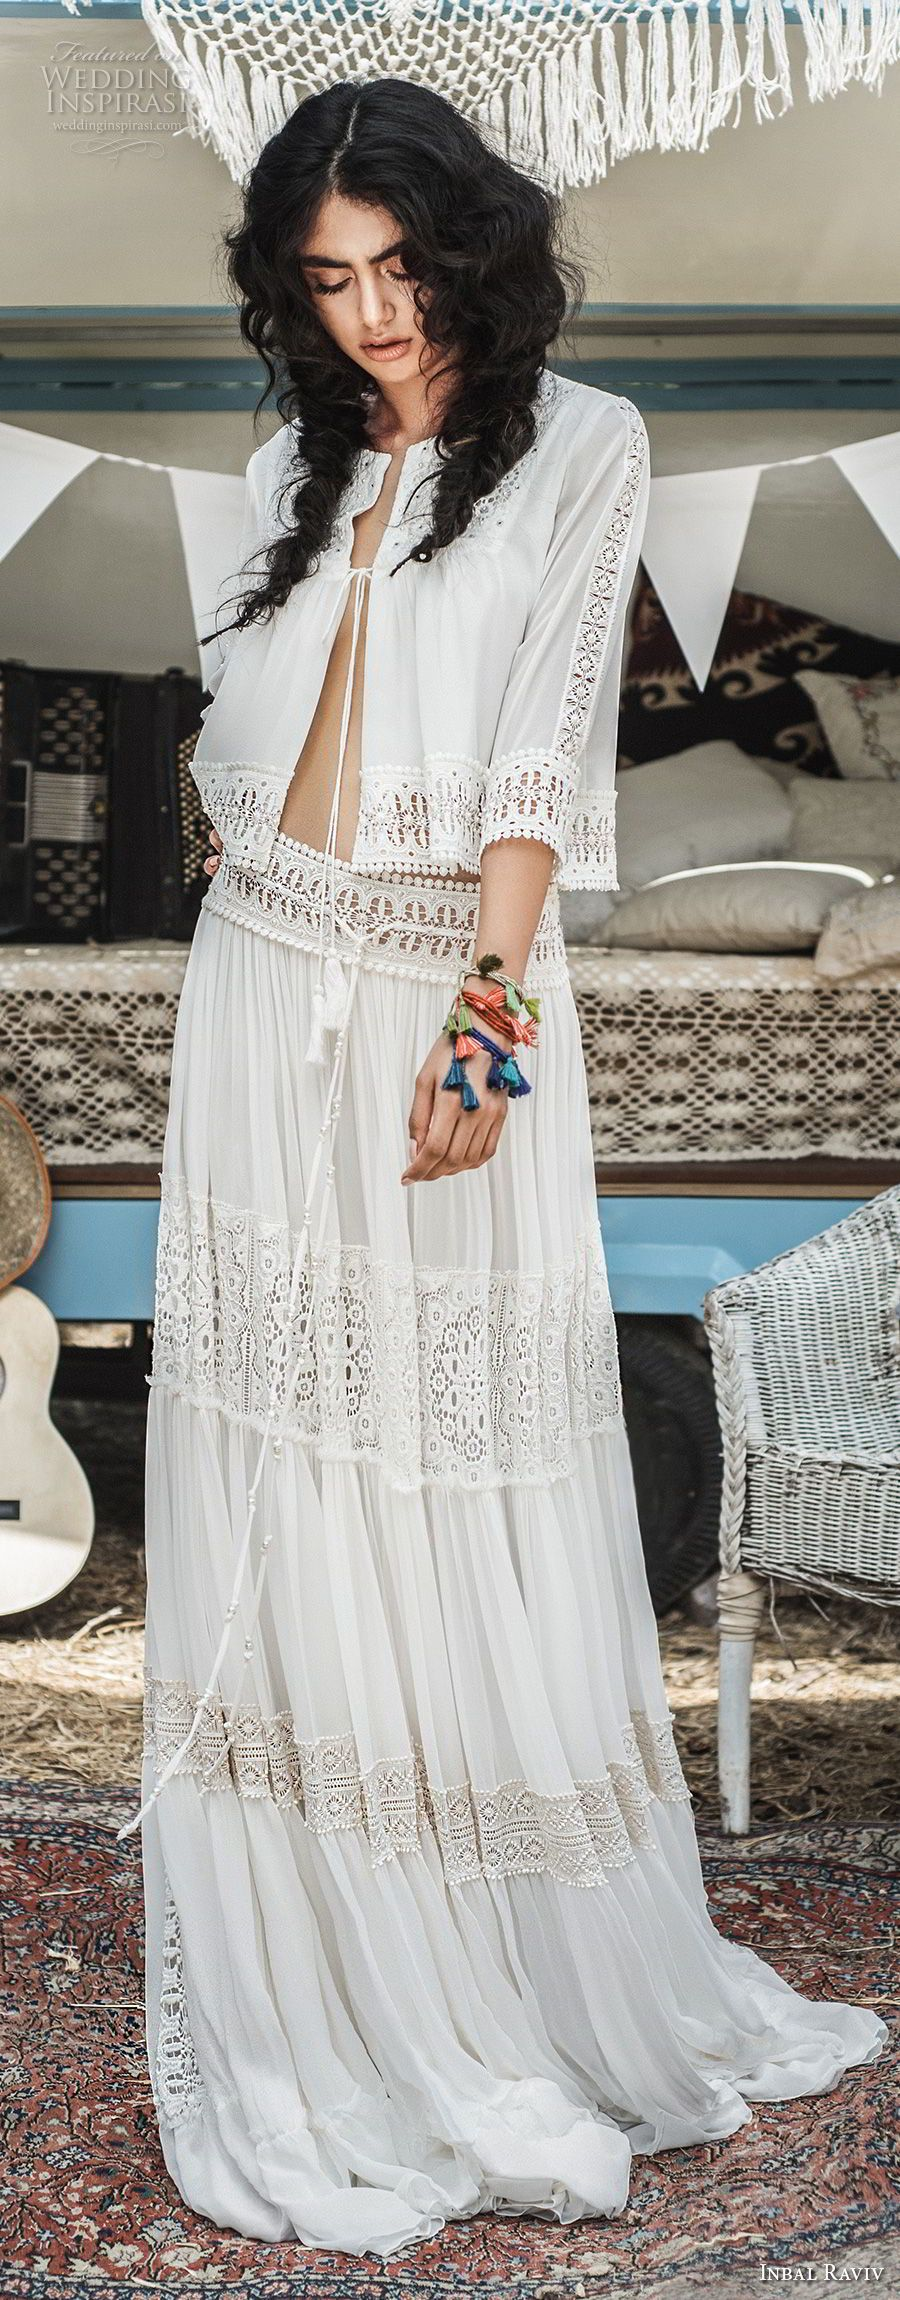 Inbal raviv wedding dresses bohemian jewel and wedding dress